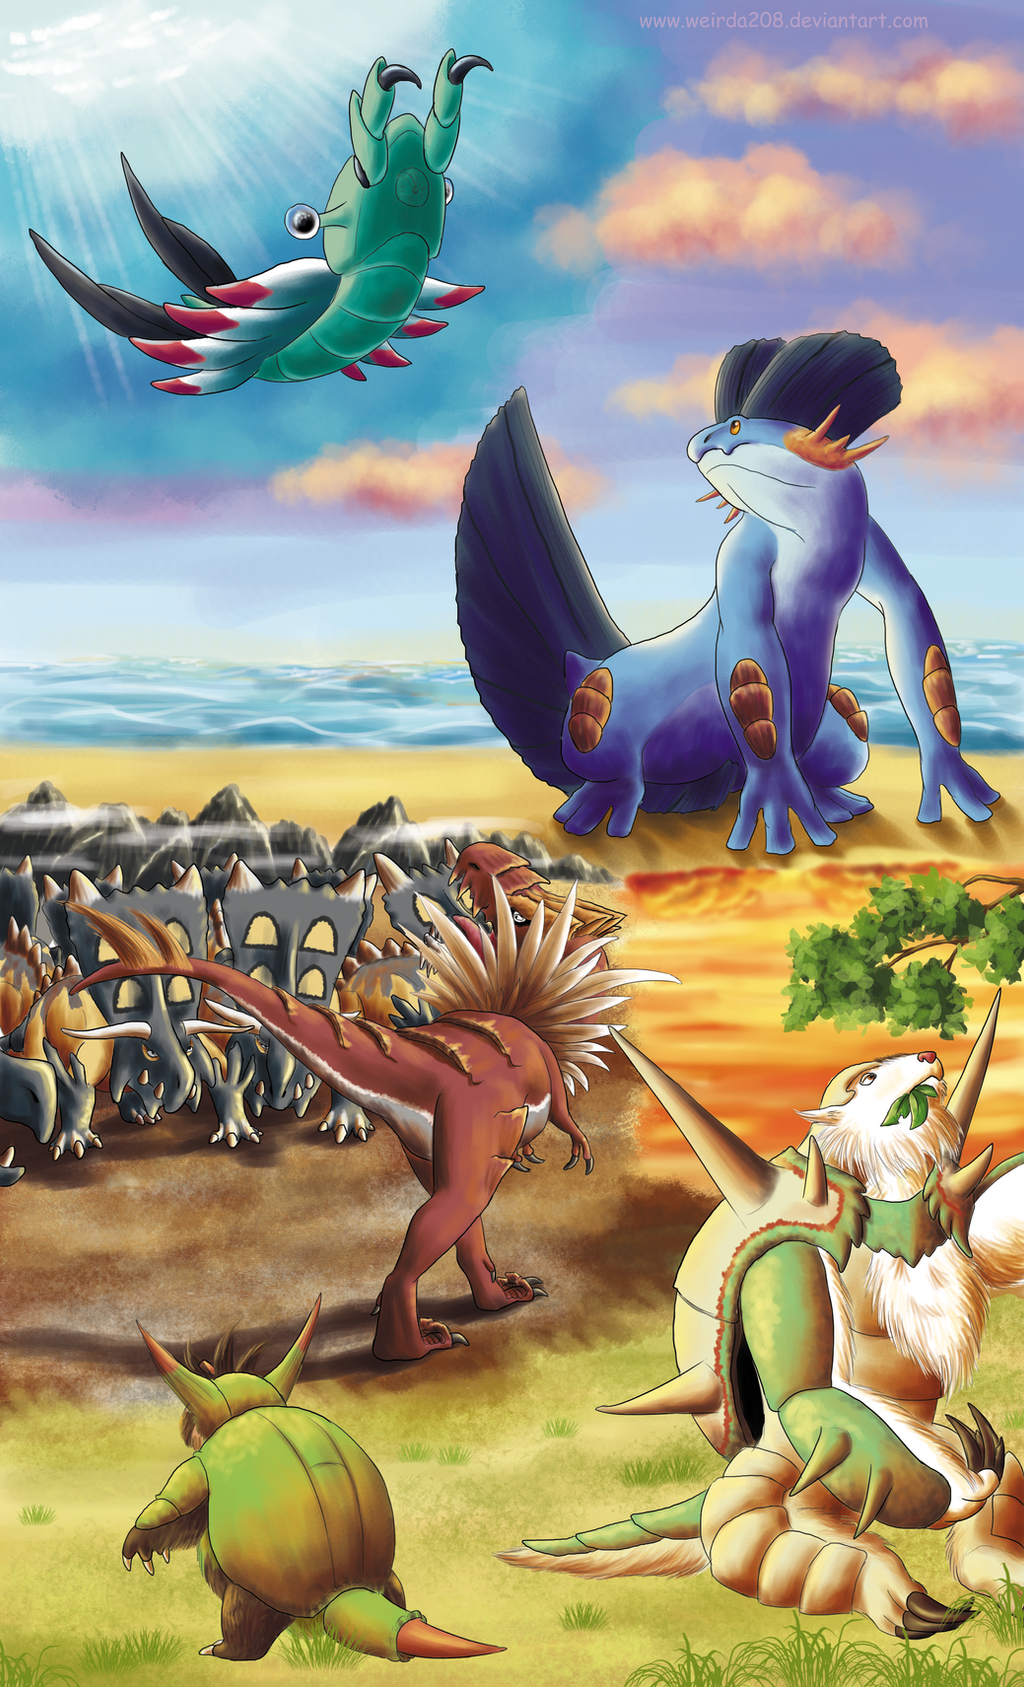 The Wonderful Pokemon Prehistory By Weirda208 On Deviantart